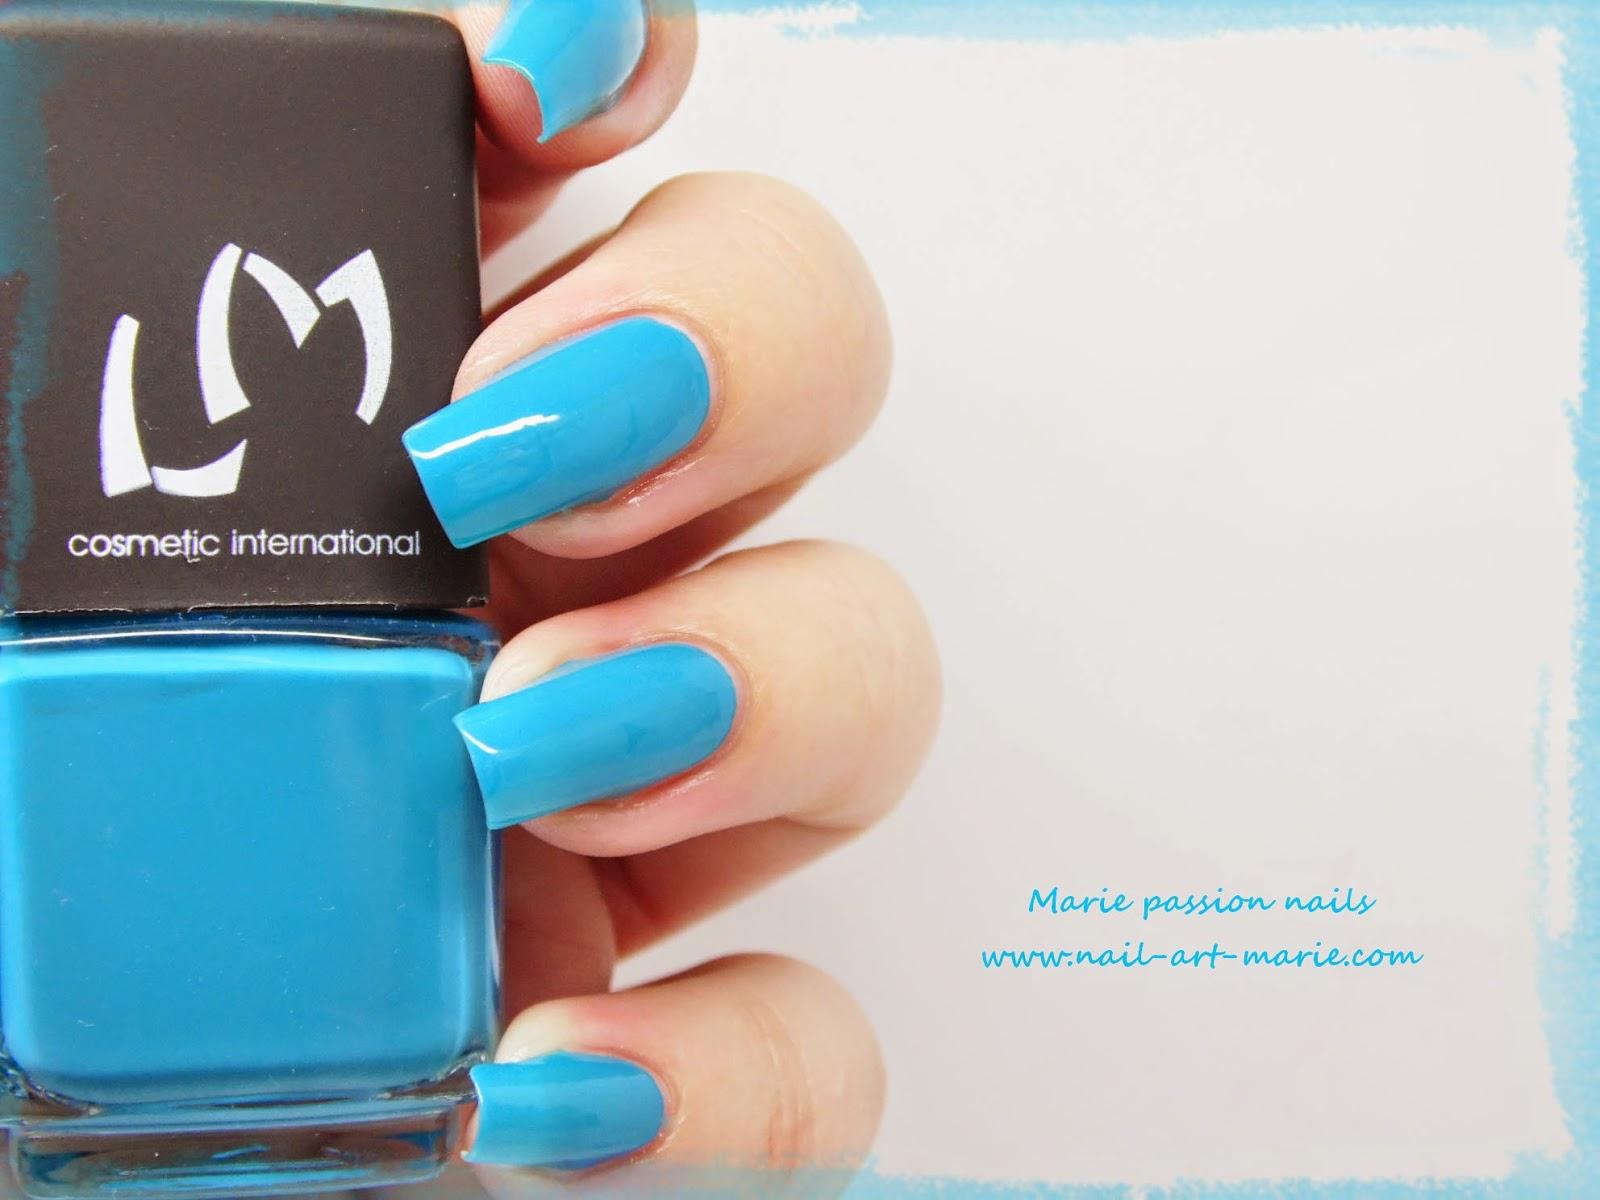 LM Cosmetic Pantanal3